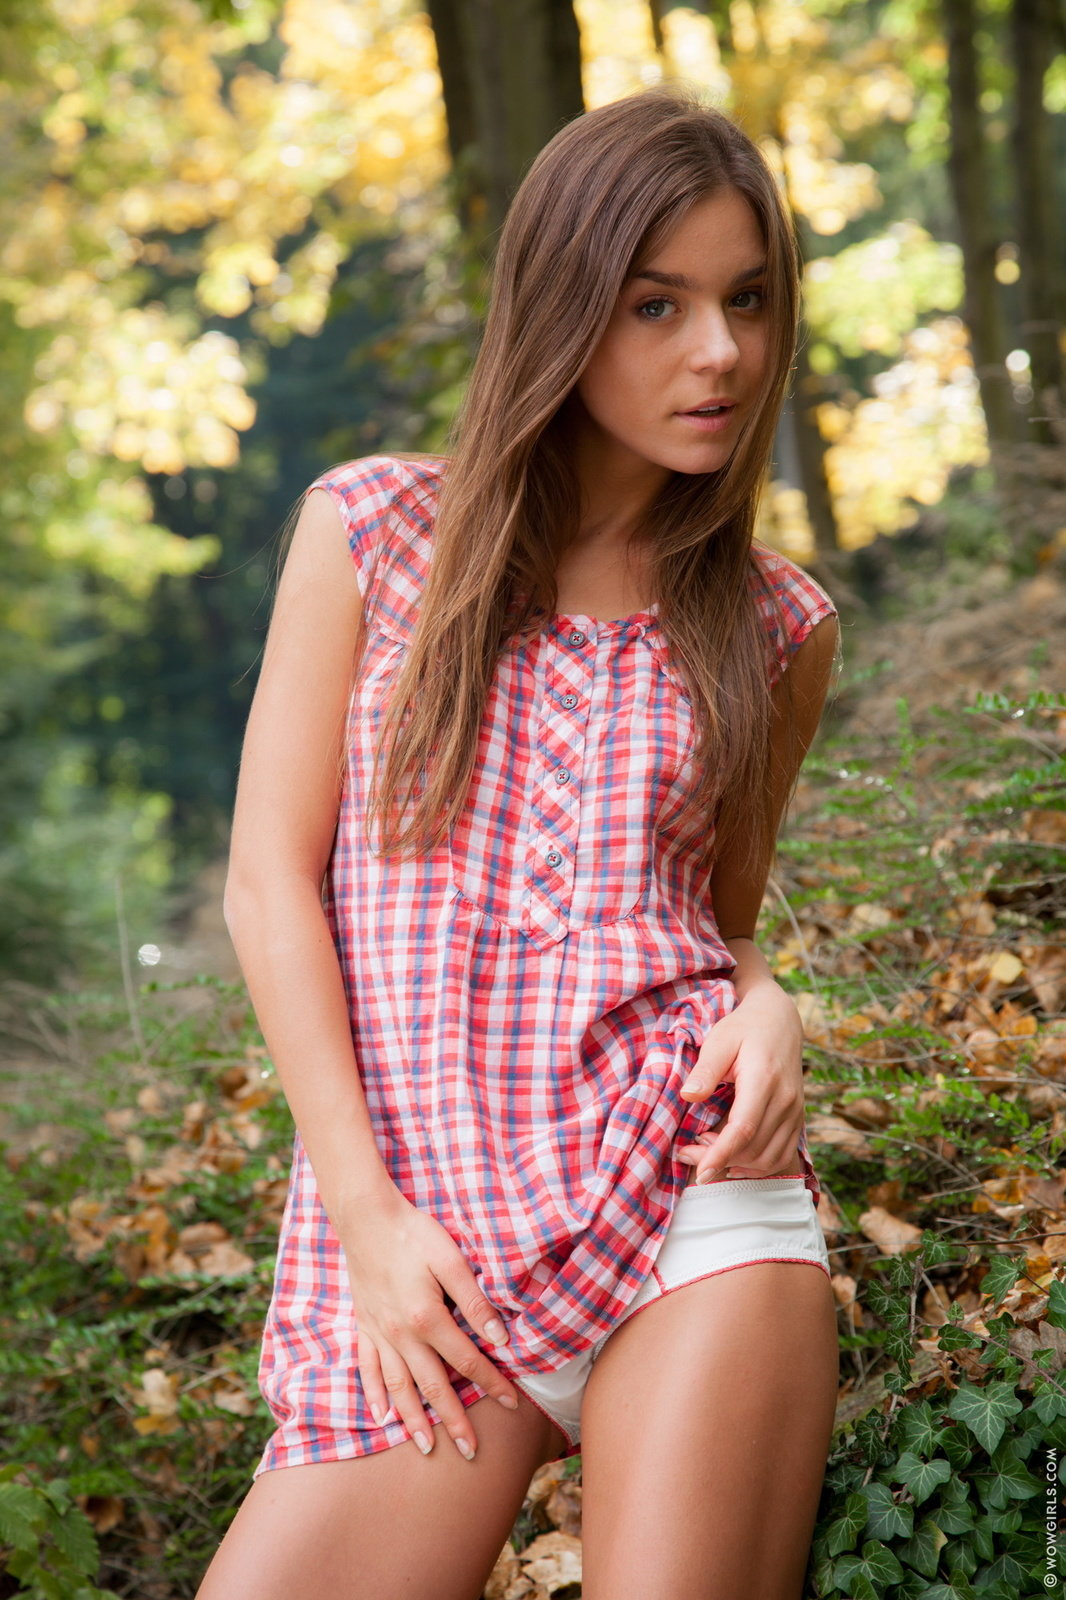 Guerlain wow girls panties